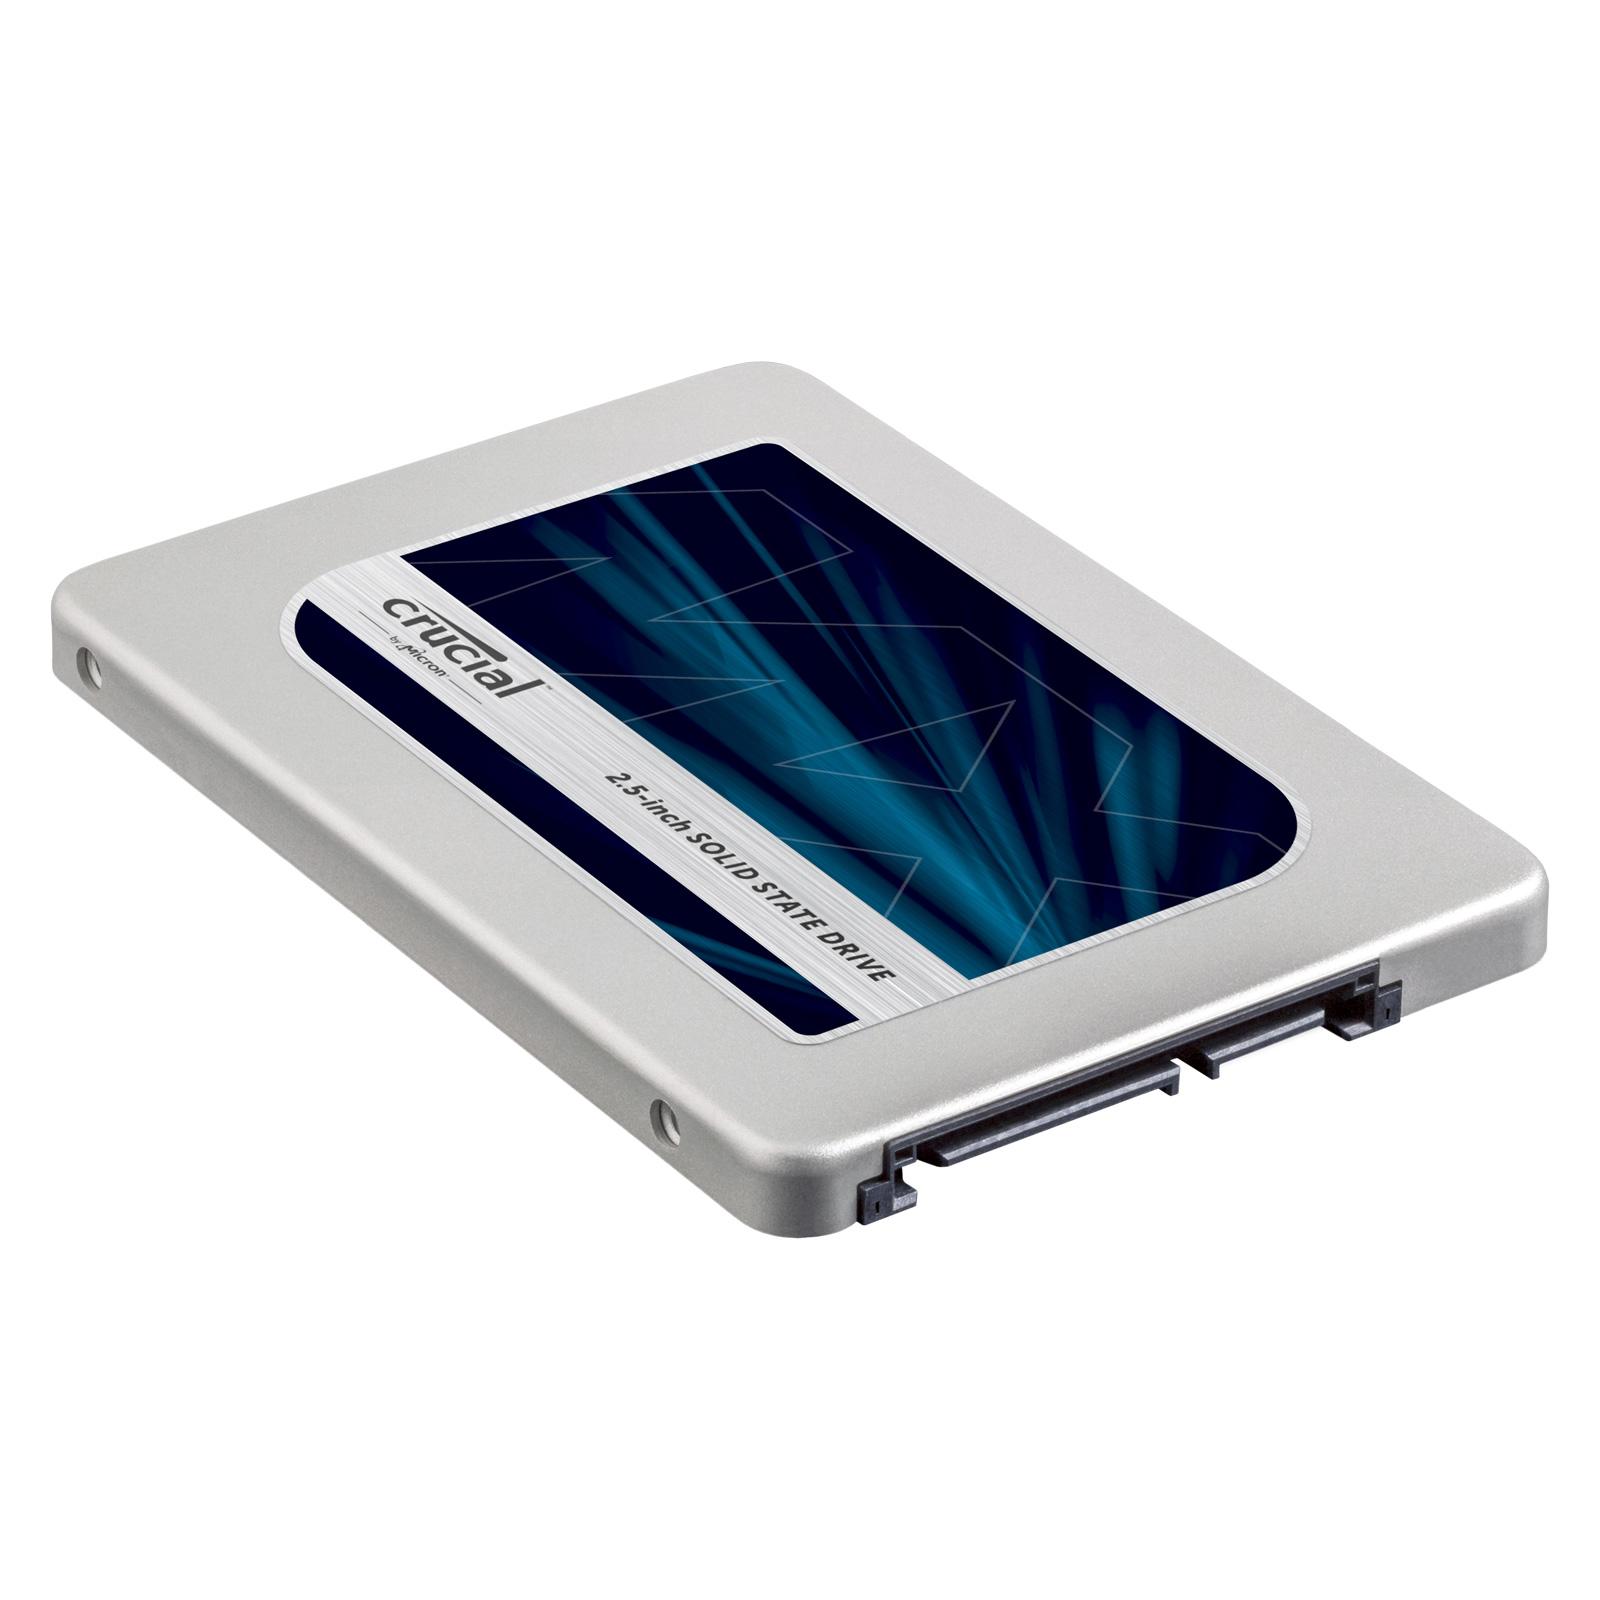 "Disque SSD Crucial MX300 1050 Go SSD 1050 Go 2.5"" 7mm Serial ATA 6Gb/s"